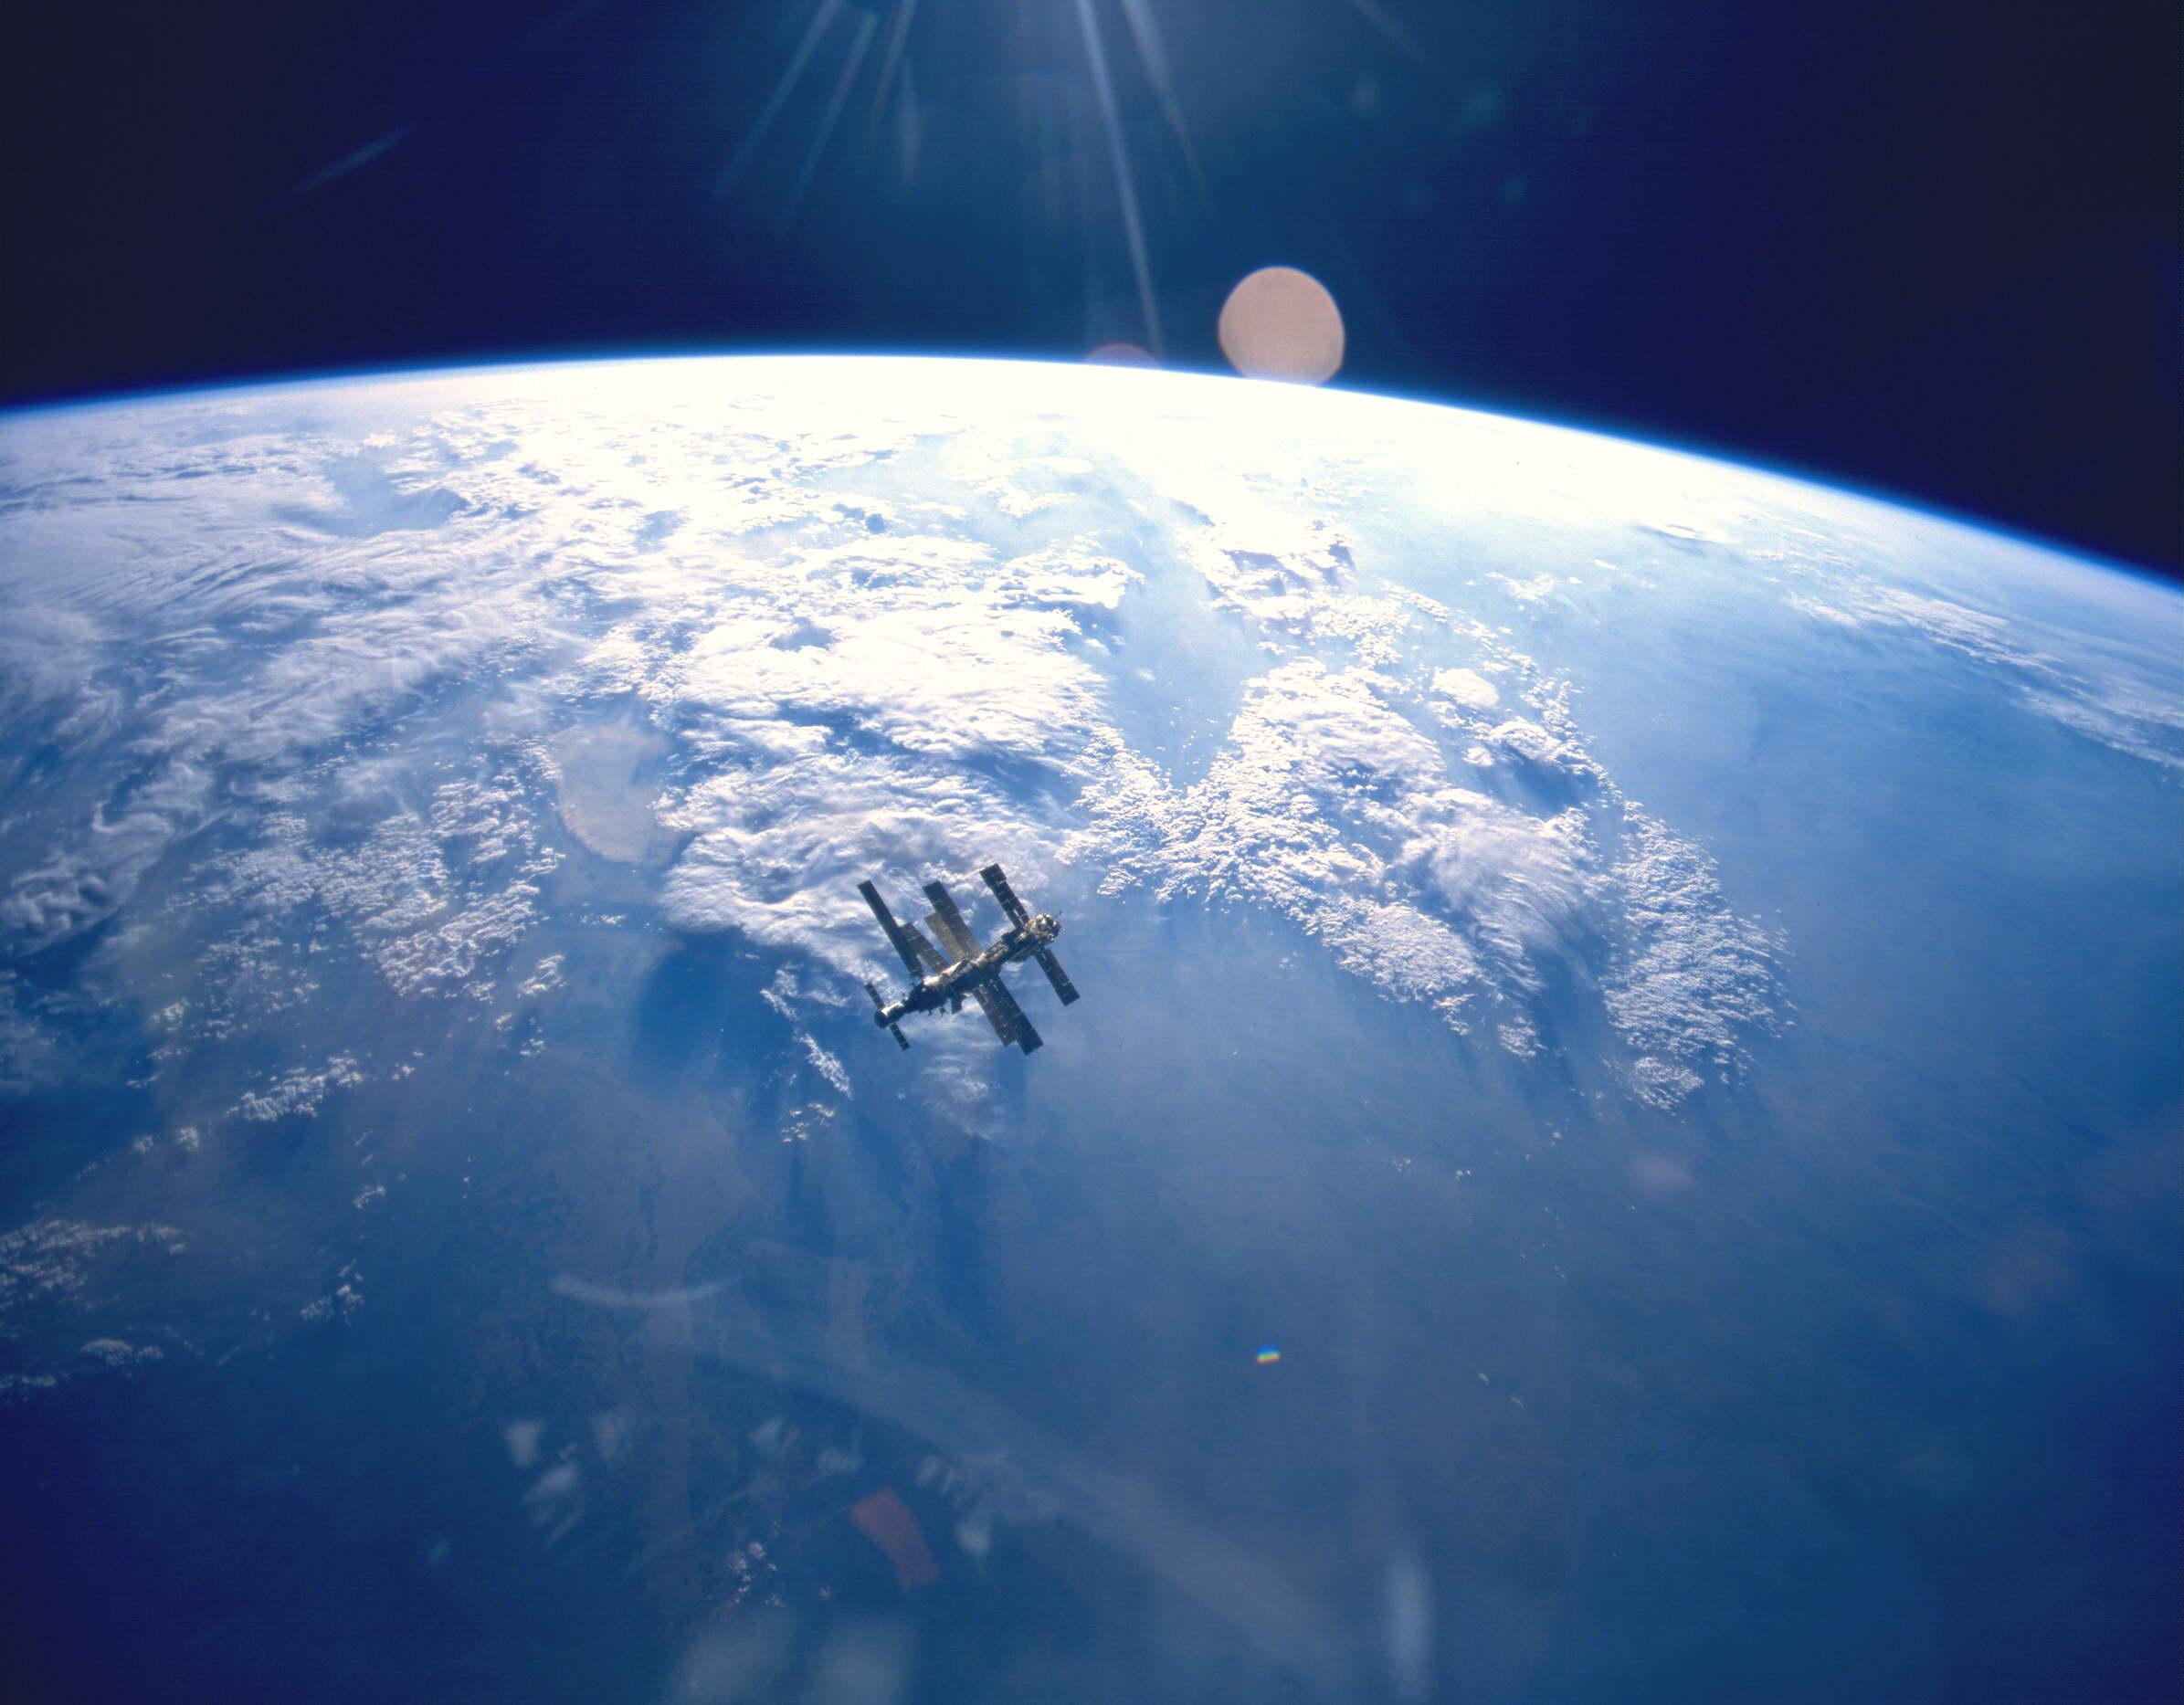 http://spaceflight.nasa.gov/history/shuttle-mir/photos/sts71/mir-imax/hmg0018.jpg